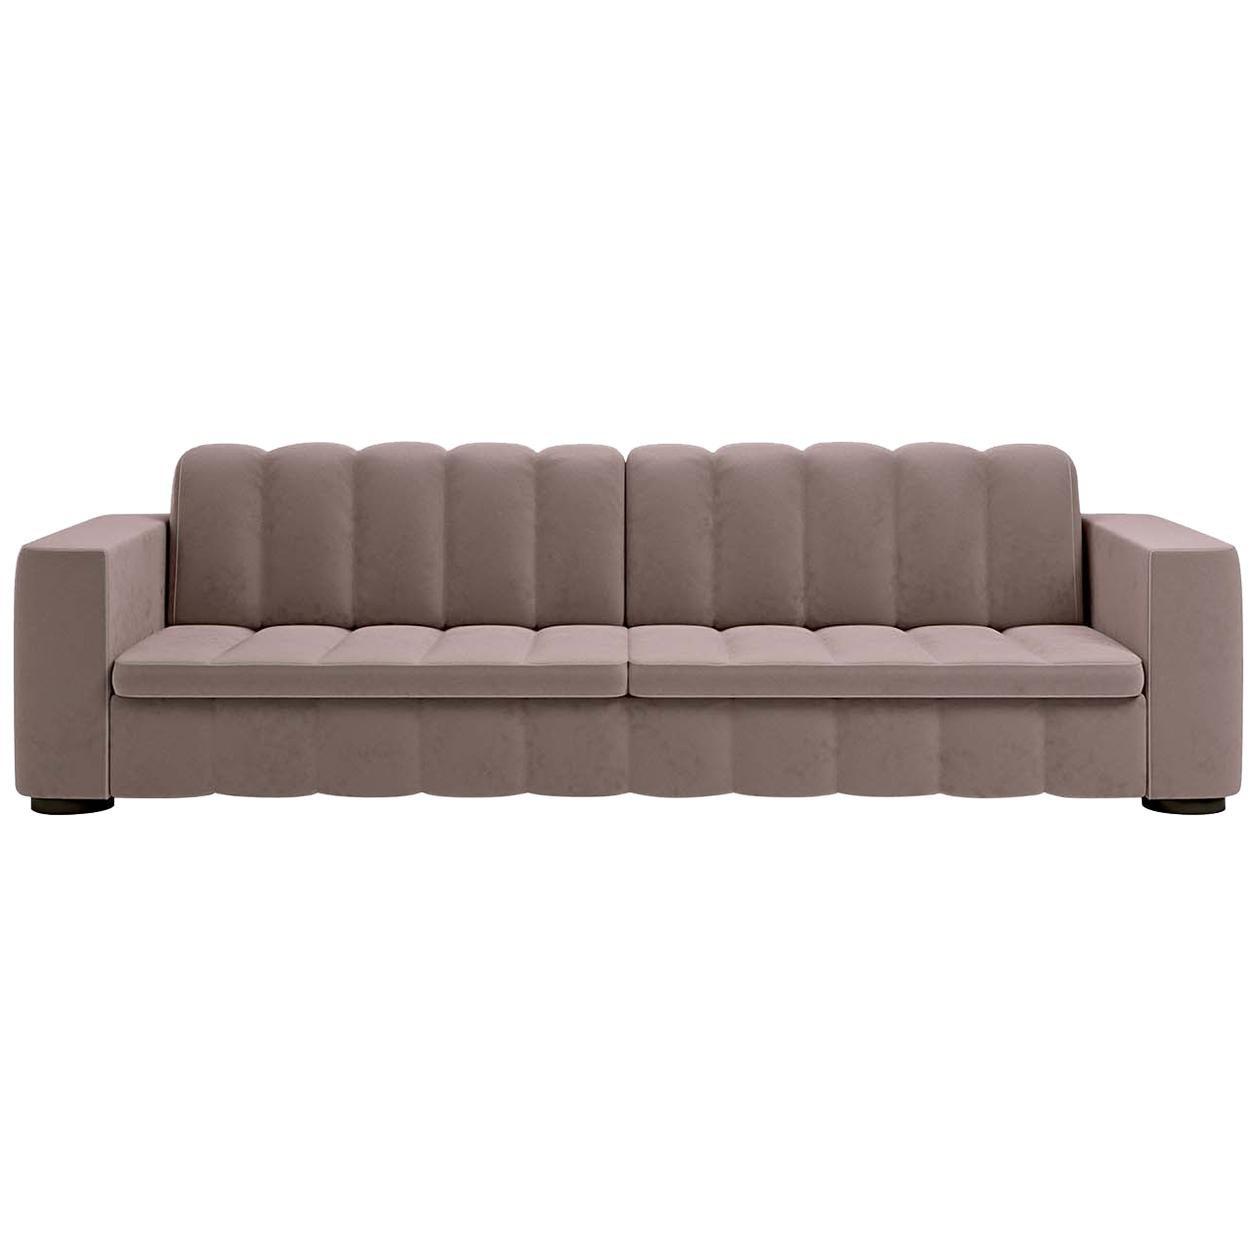 Nice Boston Sofa For Sale